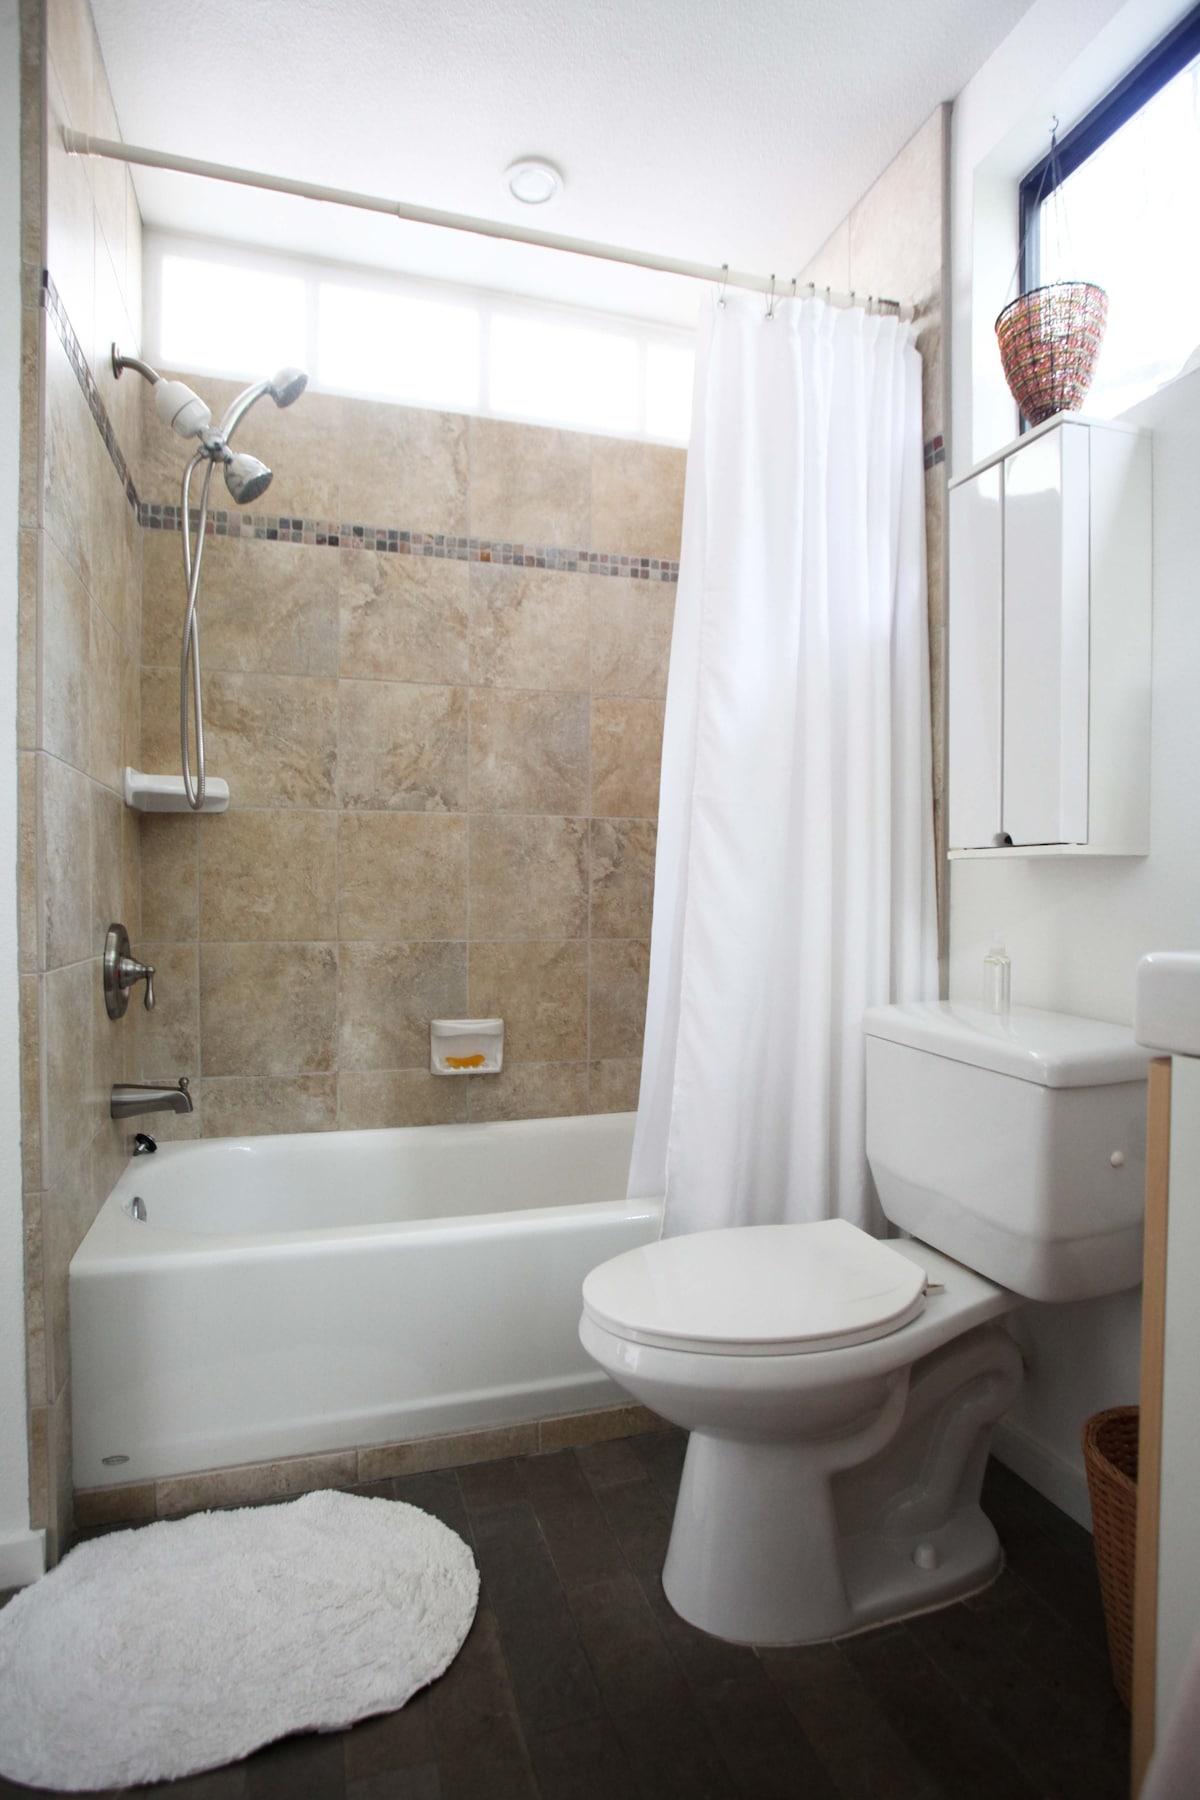 Sparkling clean modern bathroom